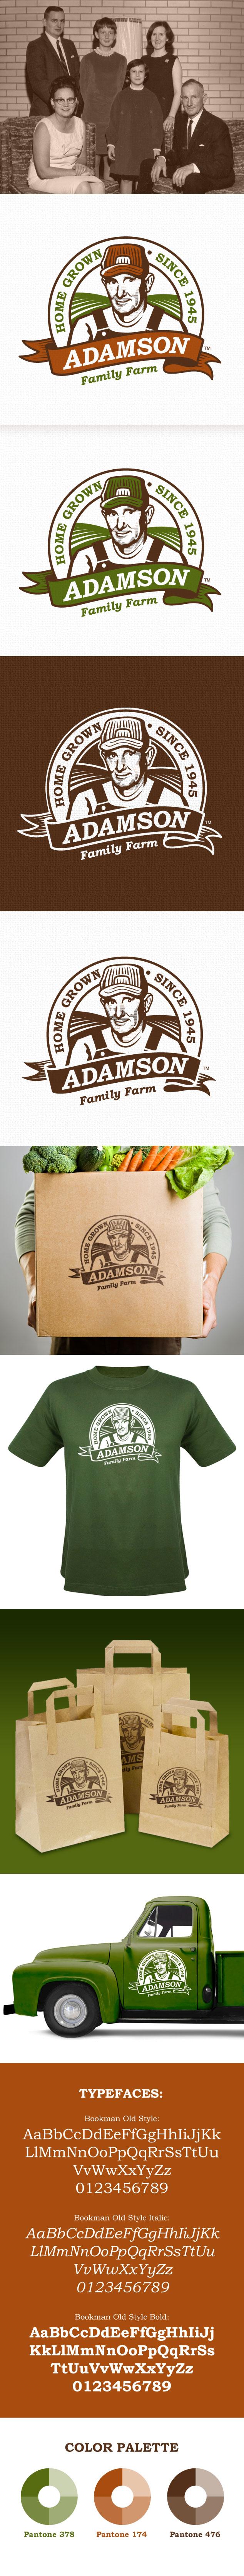 Adamson Family Farm logo design & branding